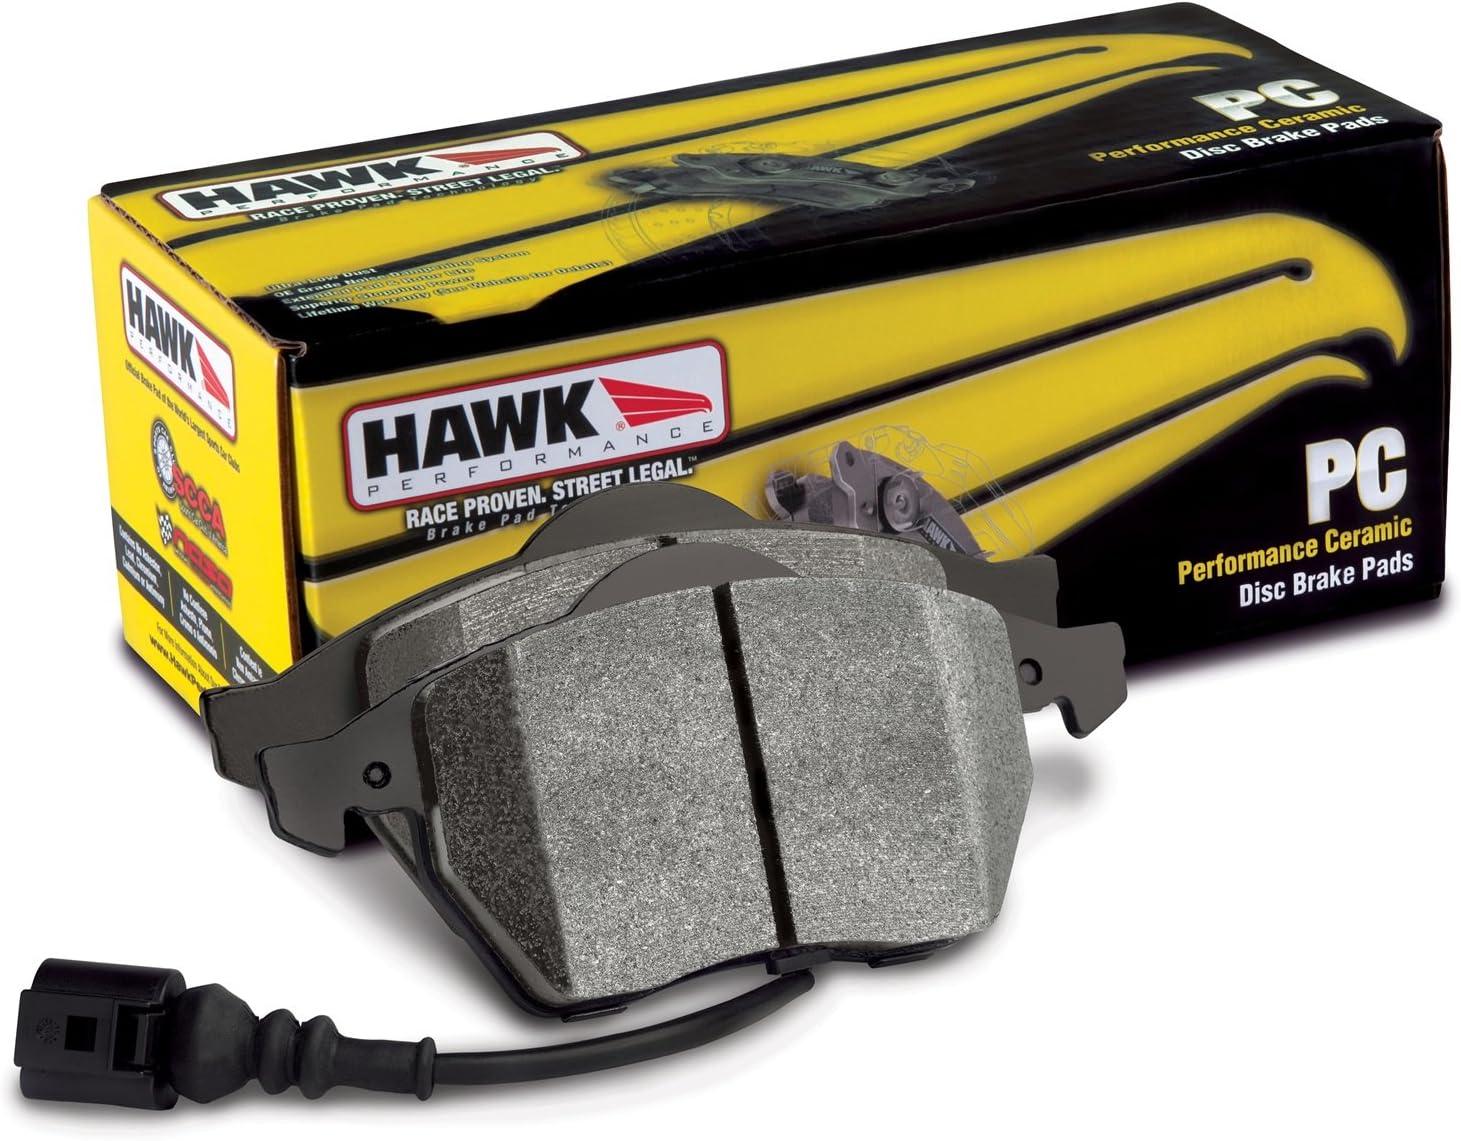 Hawk Performance HB725B.650 High Performance Street 5.0 Brake Pad